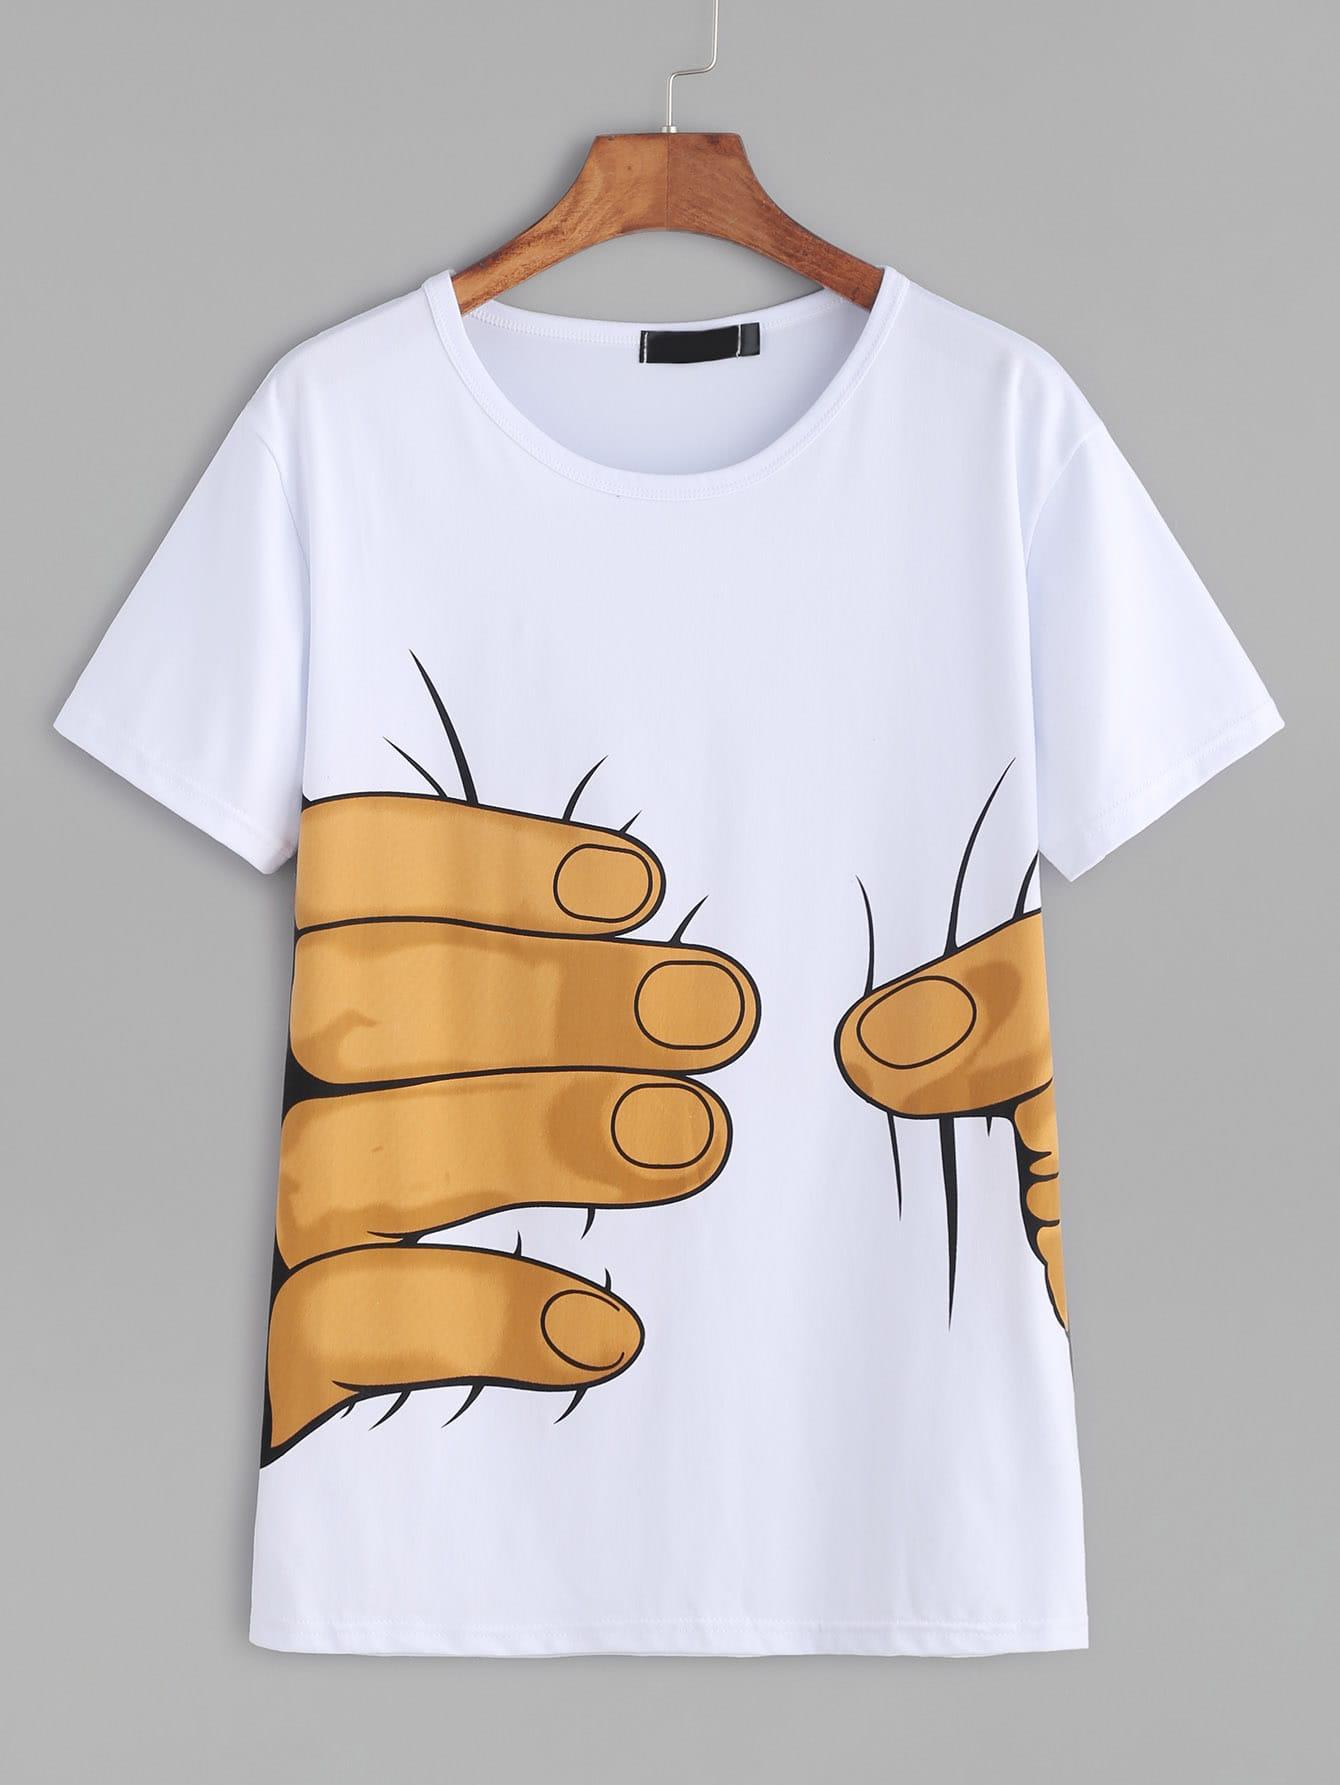 White Hand Print Short Sleeve T-shirtWhite Hand Print Short Sleeve T-shirt<br><br>color: White<br>size: L,M,S,XL,XXL